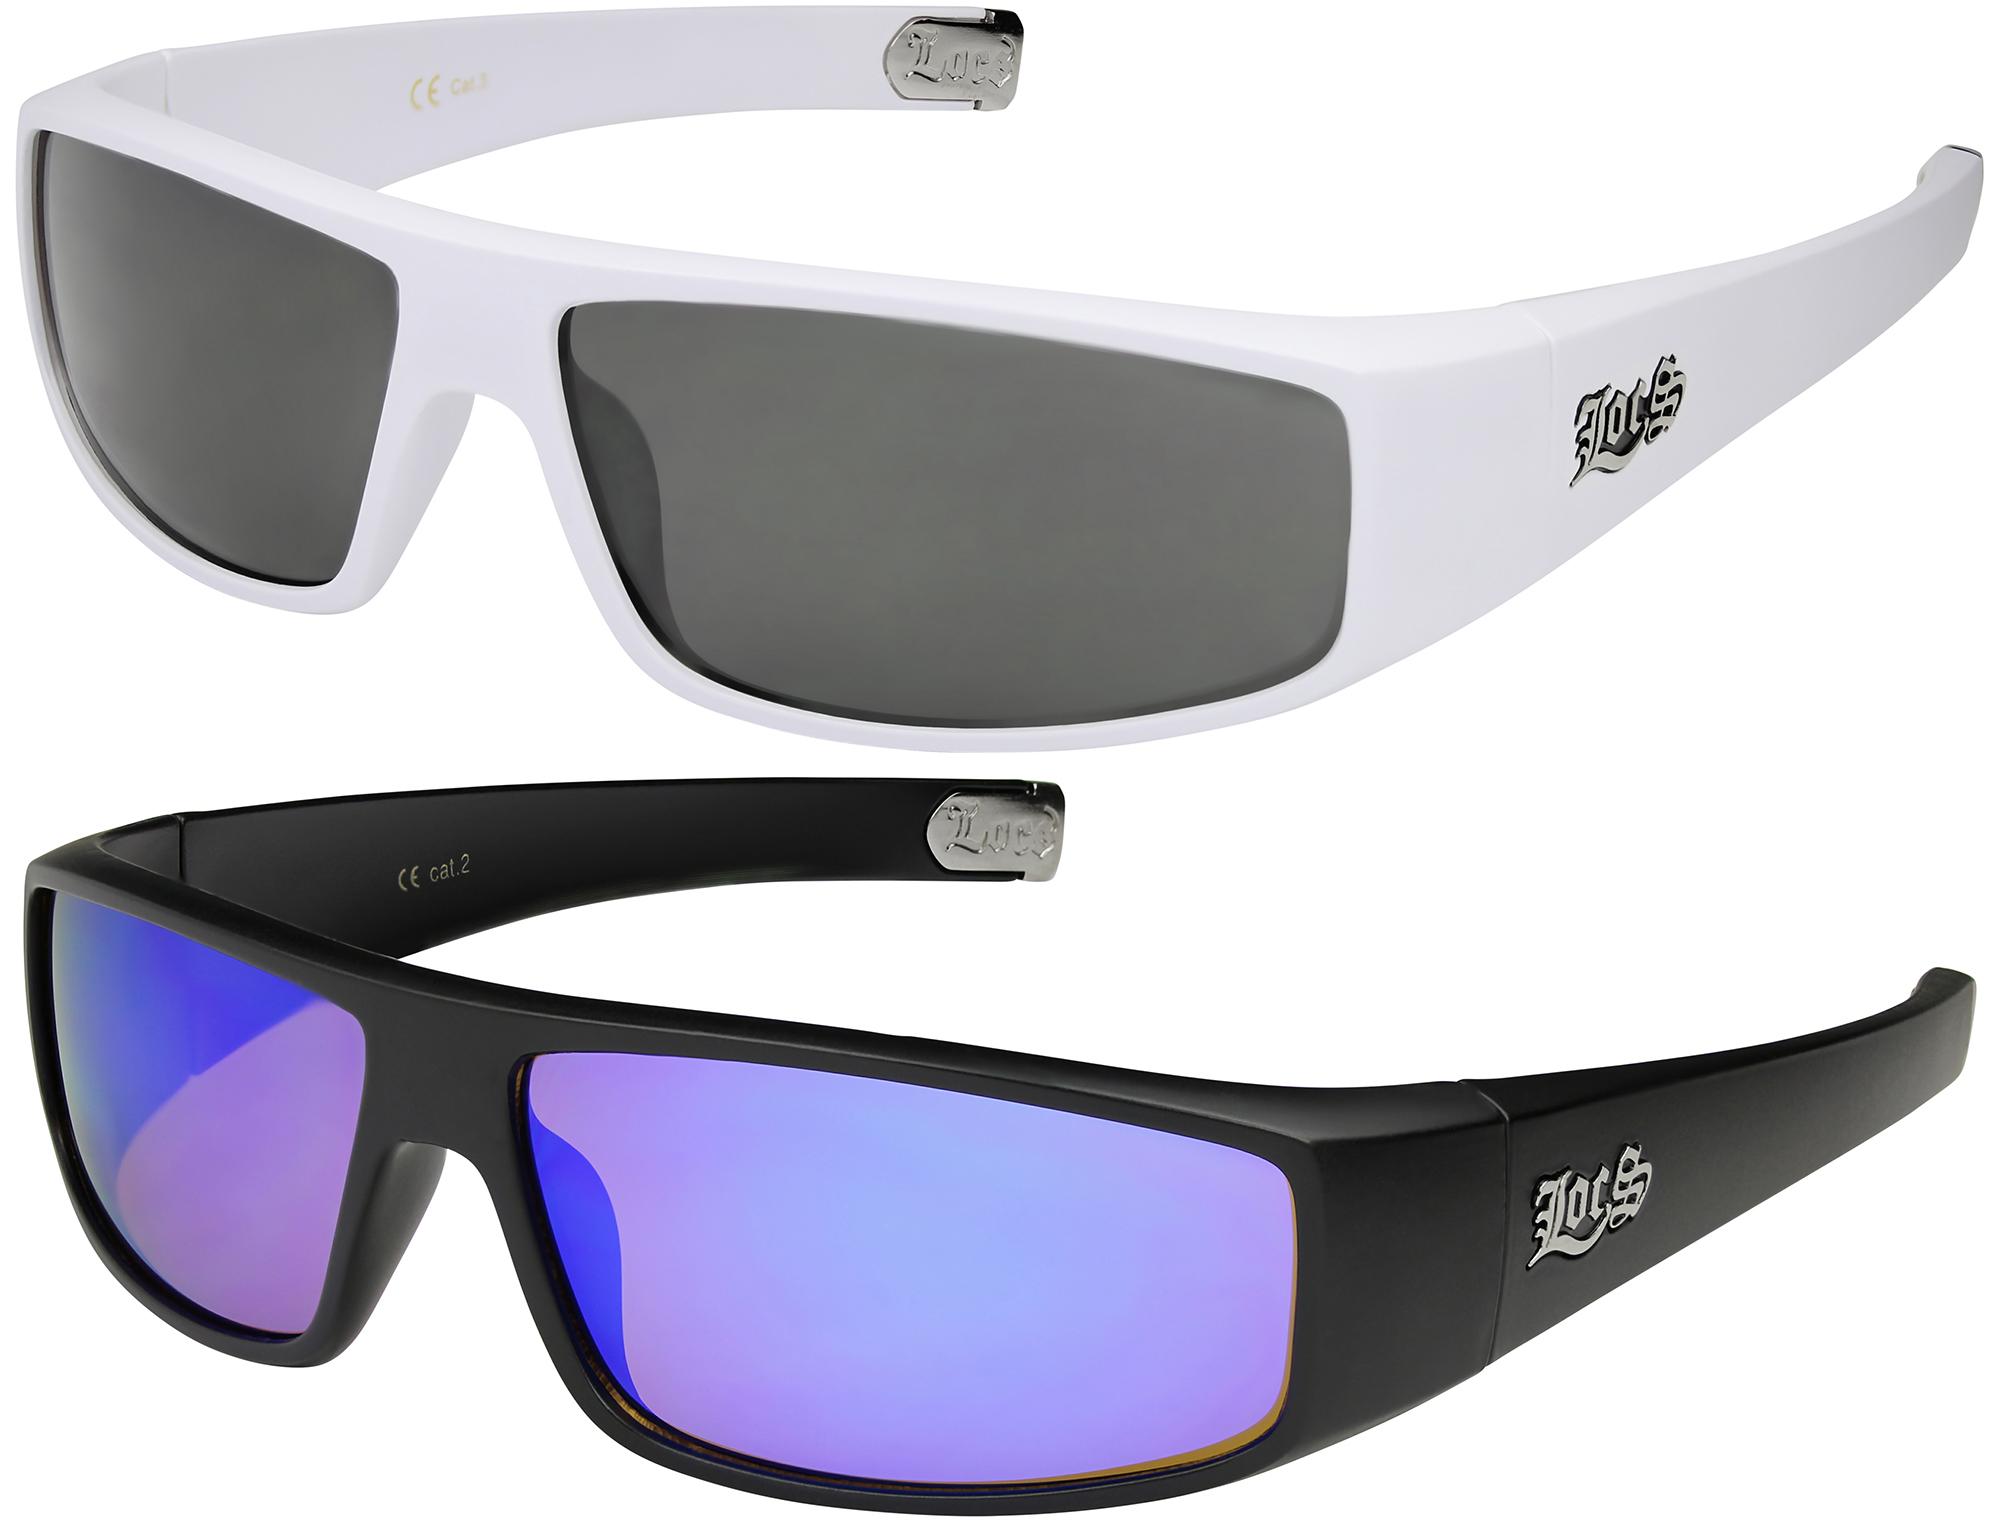 2er Pack Choppers 911 Locs Rad Brille Sonnenbrille Männer Frauen schwarz silber Kleding en accessoires Zonnebrillen